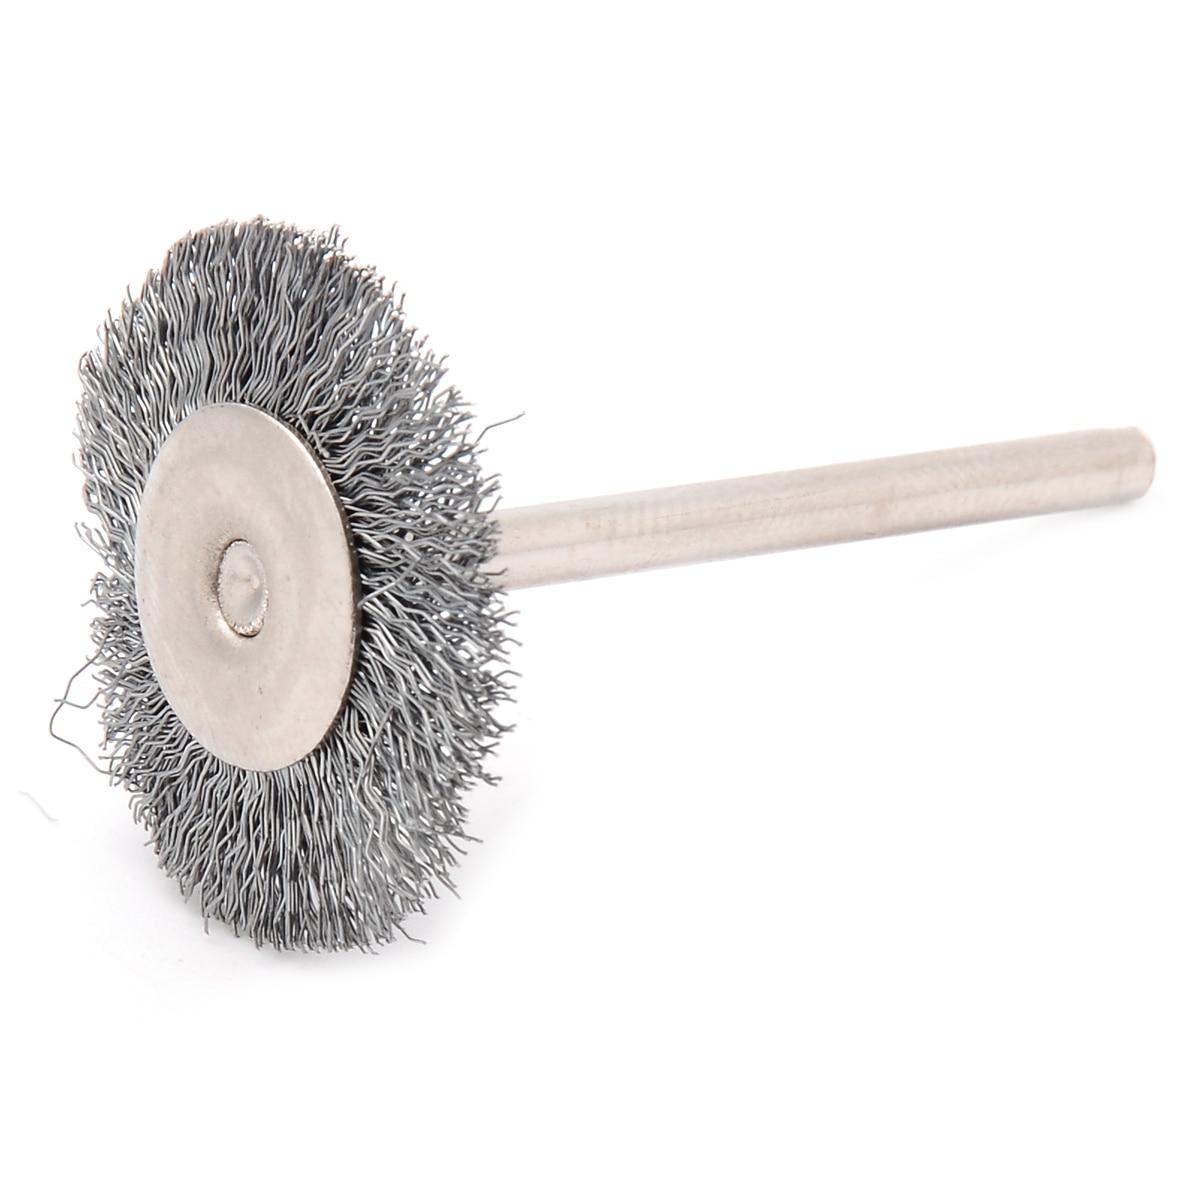 10 Pieces Polishing Grinding Tool 240 Grit 25mm x 24mm x 3mm Flap Wheel Brush